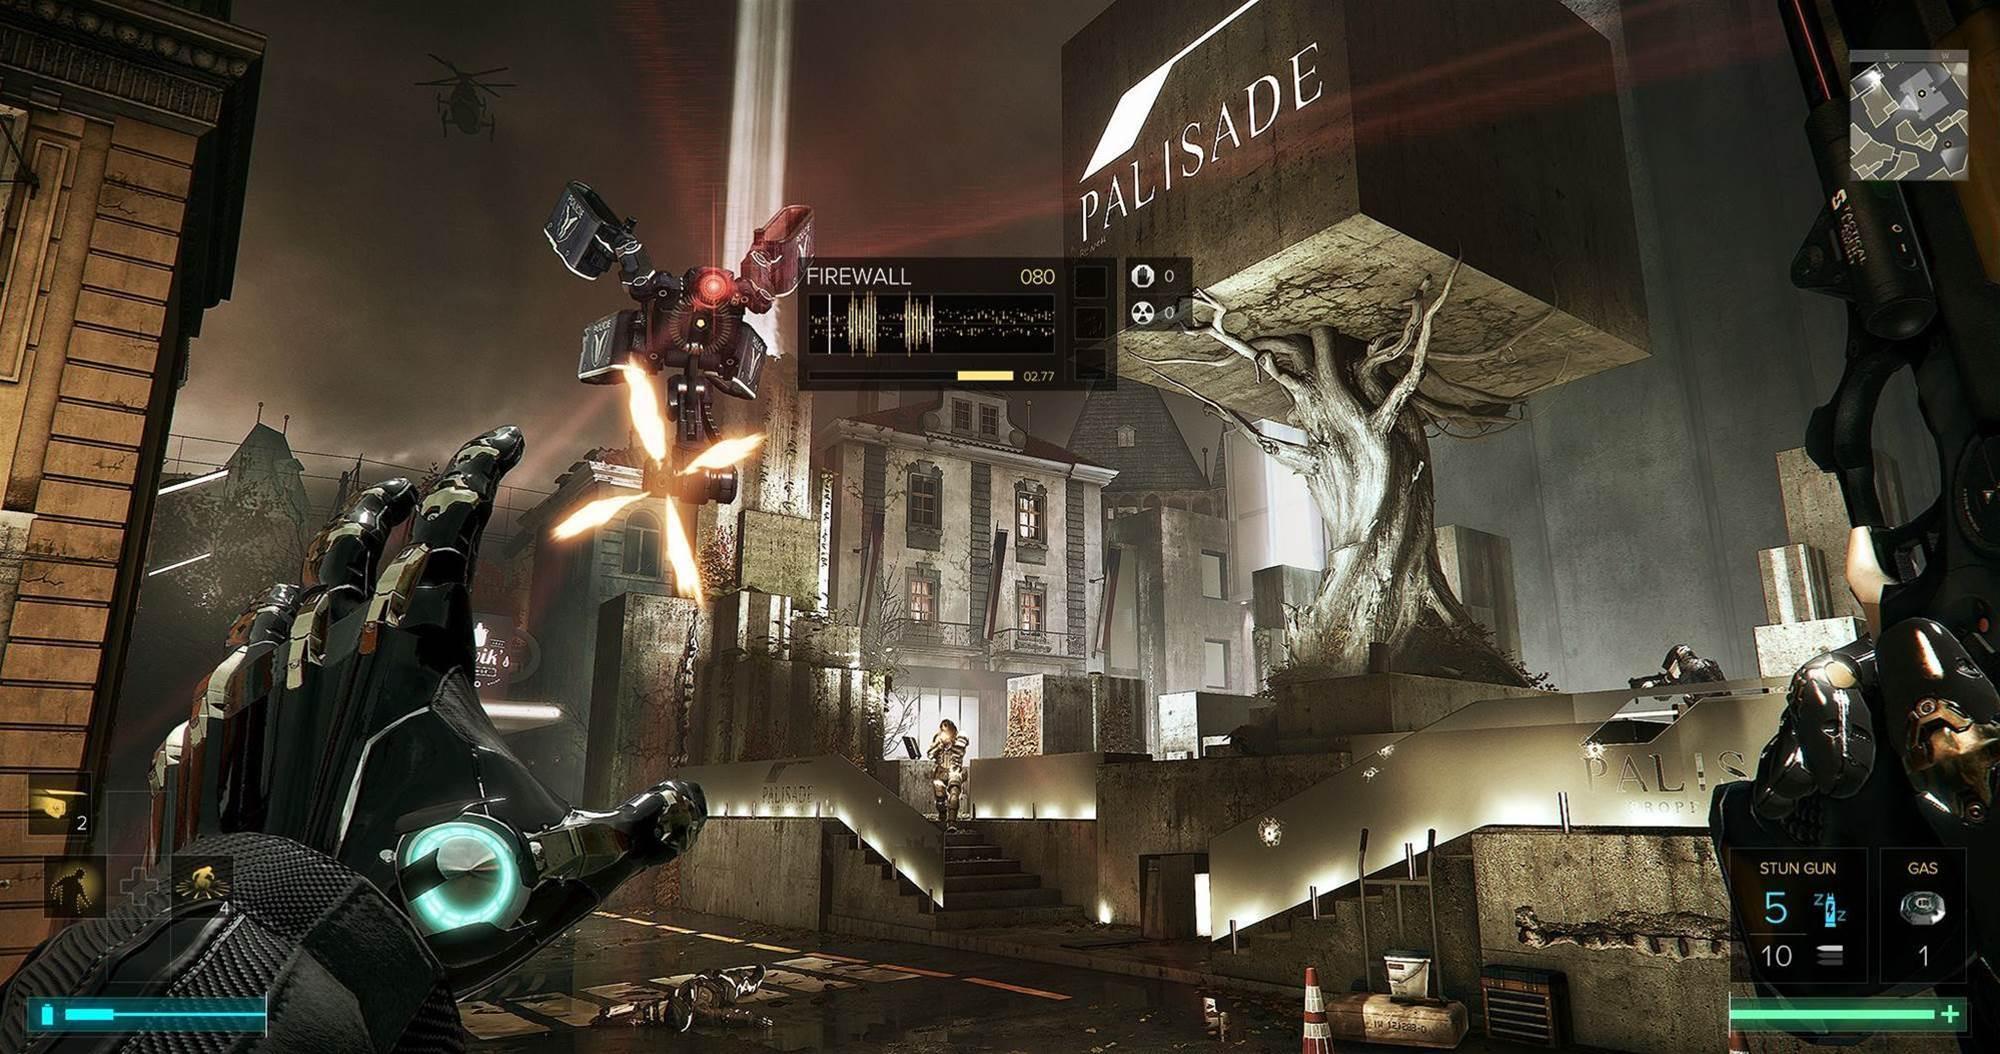 PlayStation Plus January games include Deus Ex, Batman